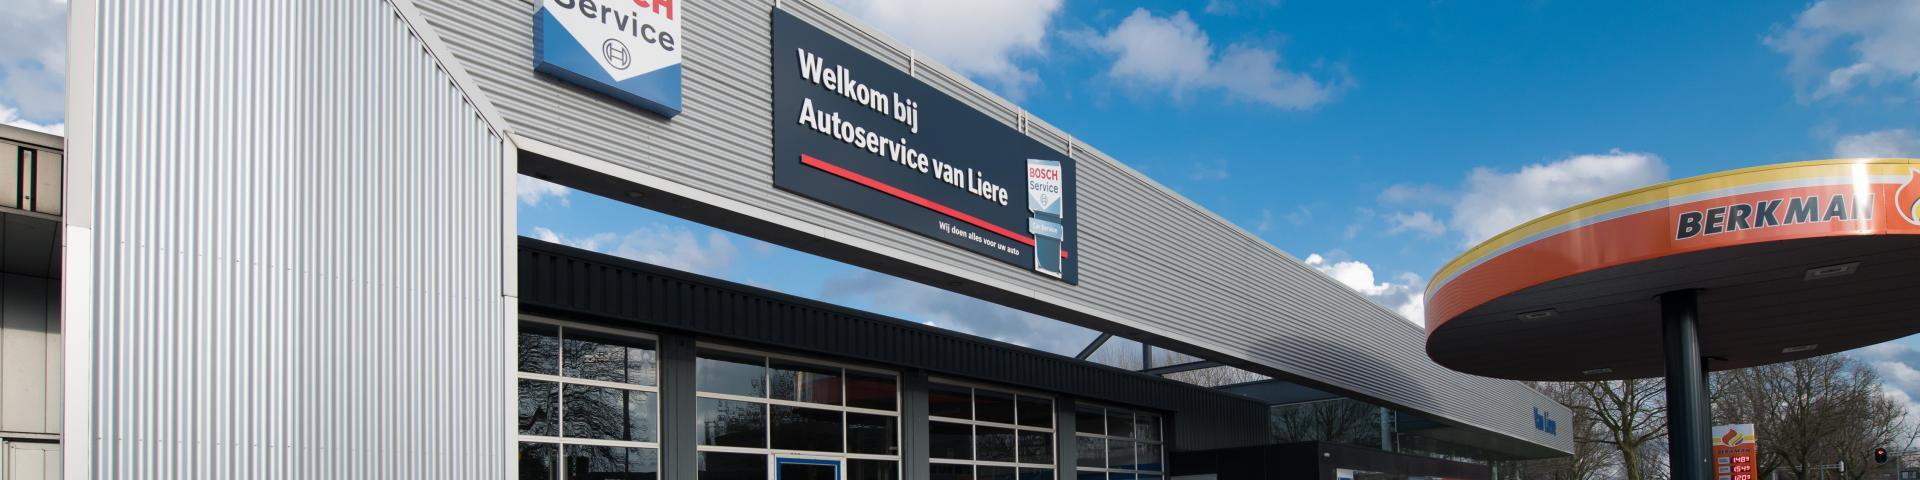 Bosch Car Service van Liere Vlissingen